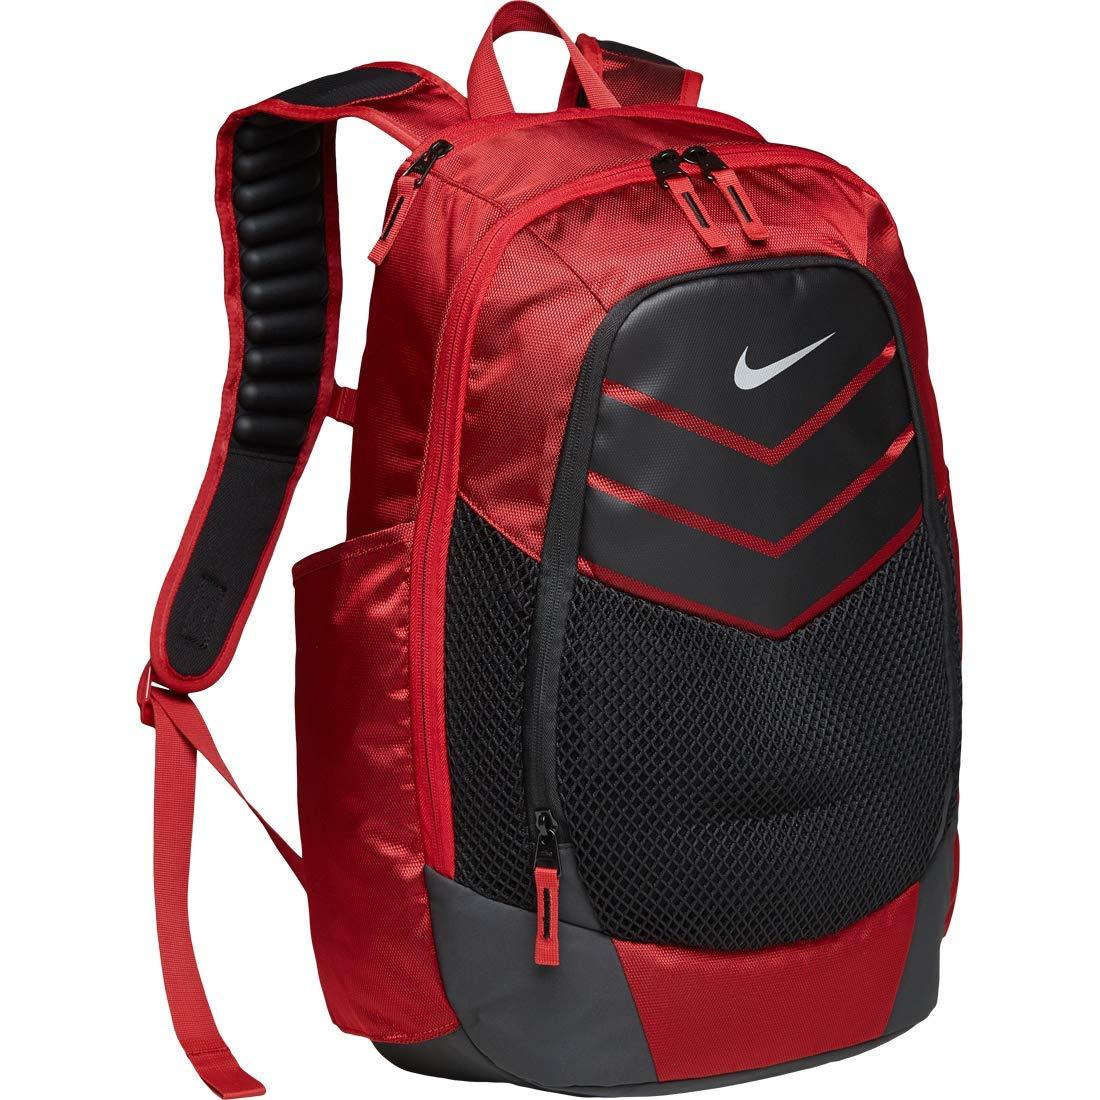 Nike Vapor Power Backpack Backpack University RedBlack